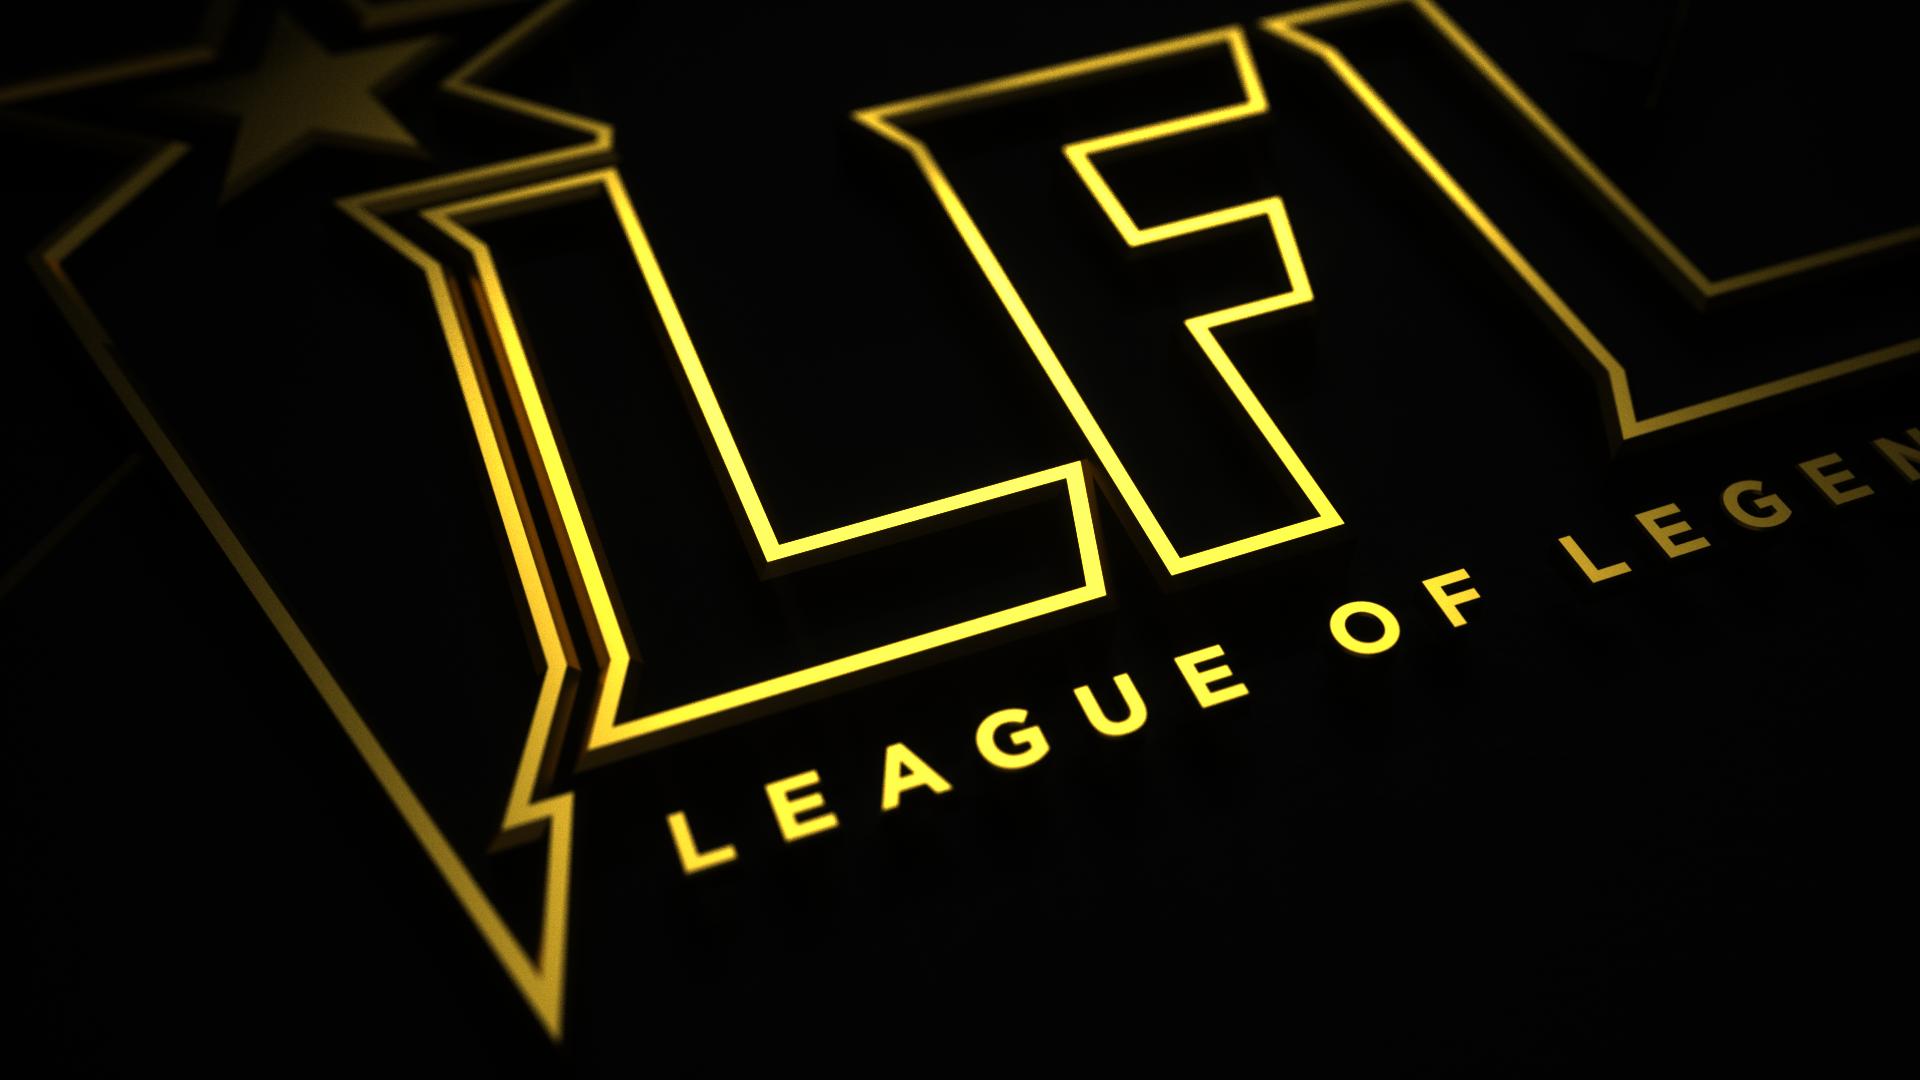 Lfl2020 keyarts logo 2